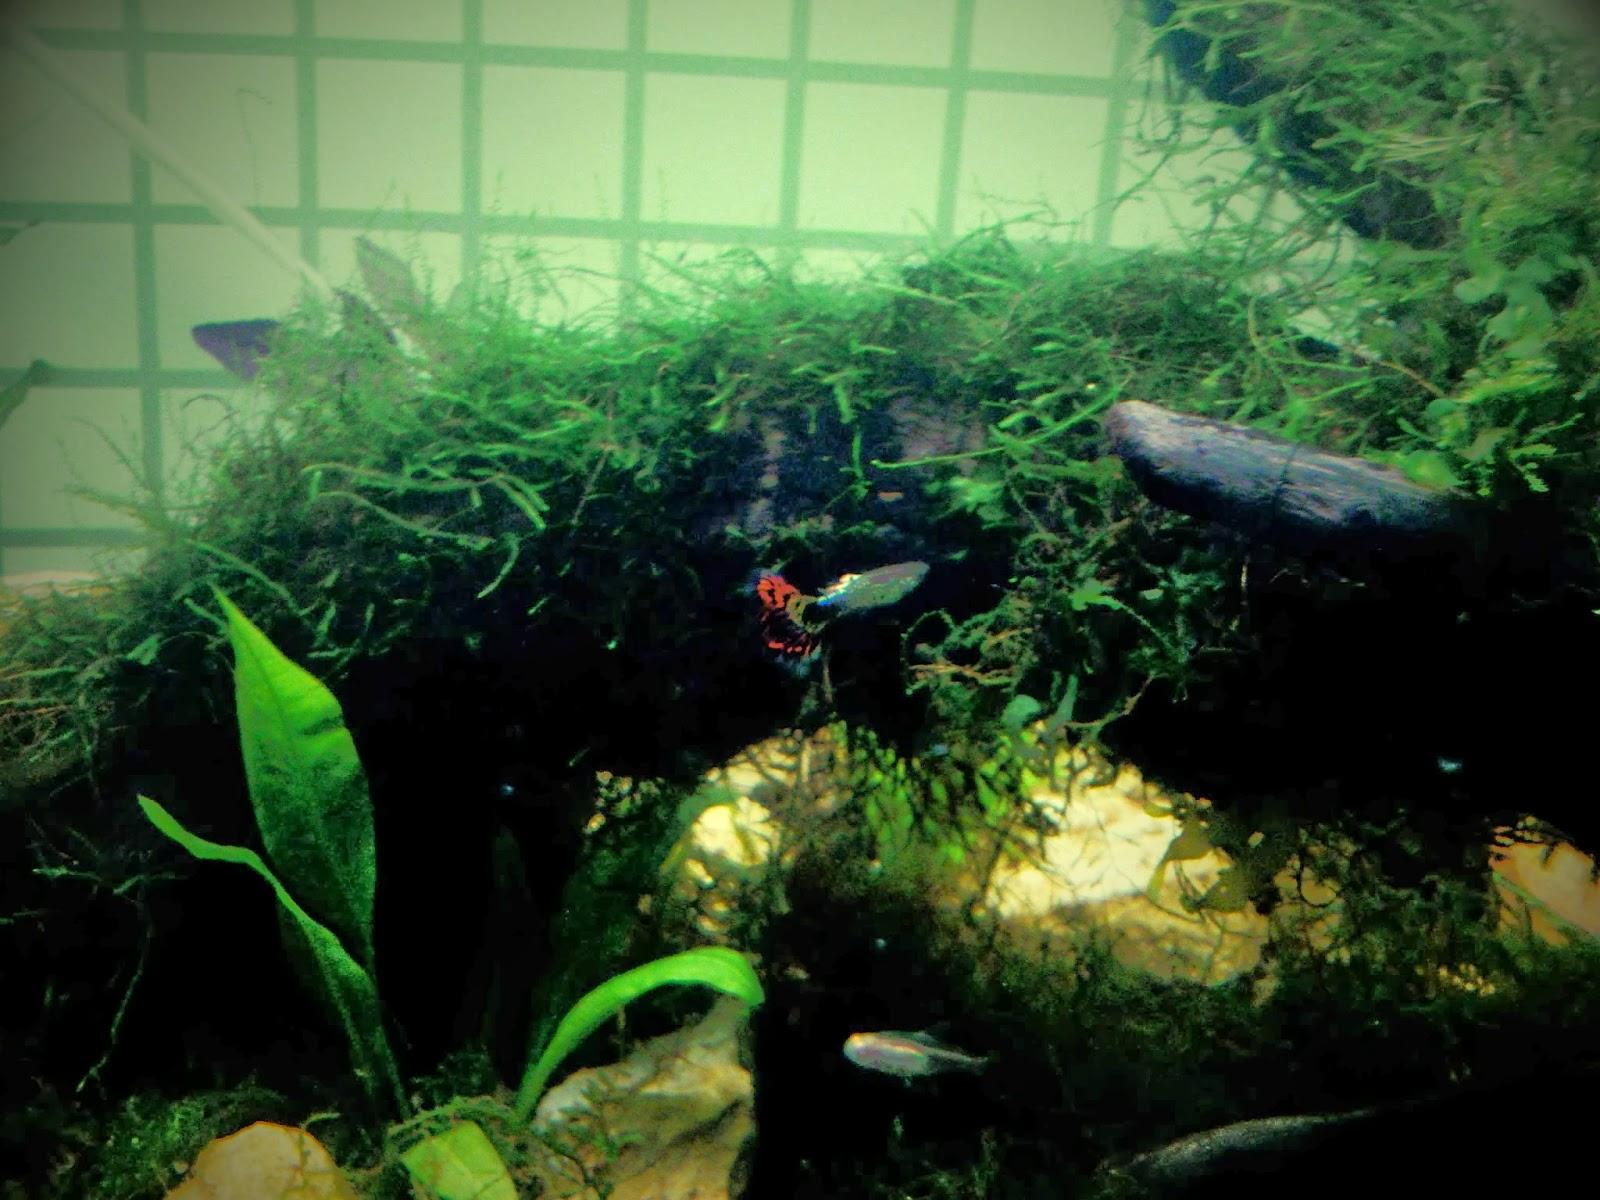 Artikel Tentang Cara Membuat Filter Aquarium Murah Dan Sederhana | CA ...